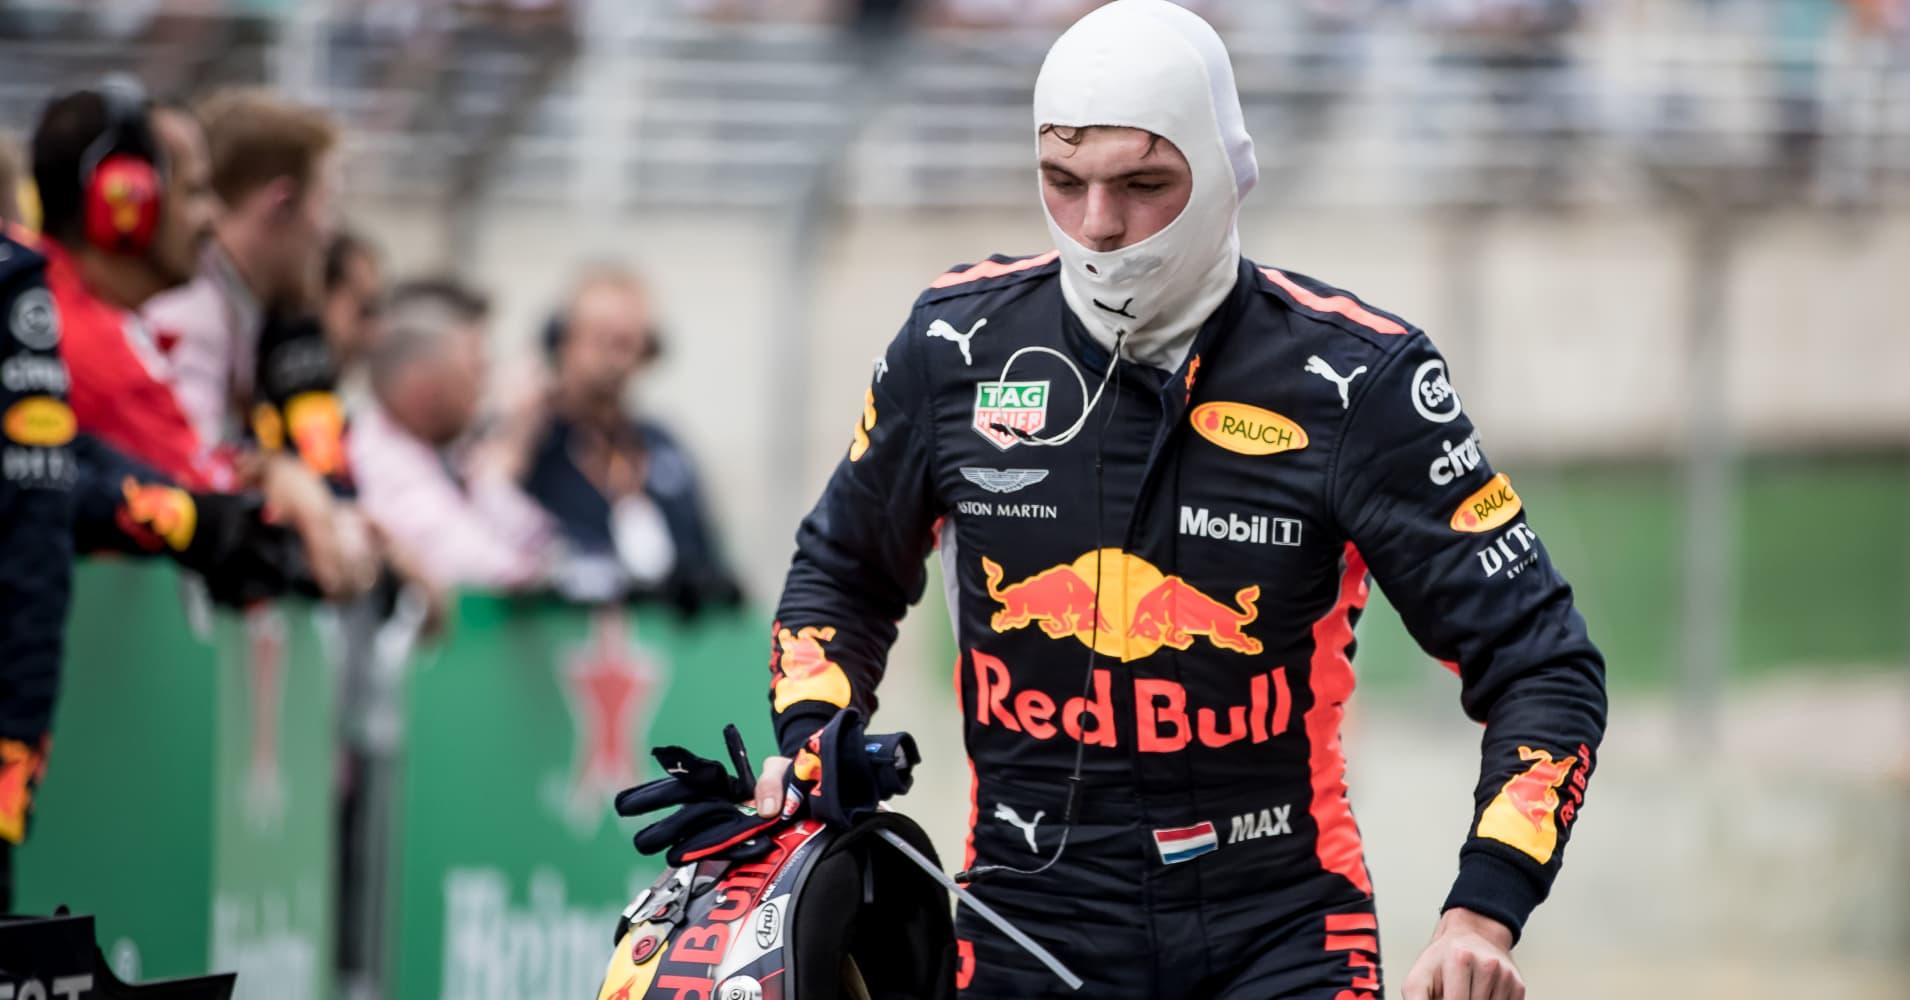 Netherlands looks set to regain Grand Prix slot in Formula One calendar